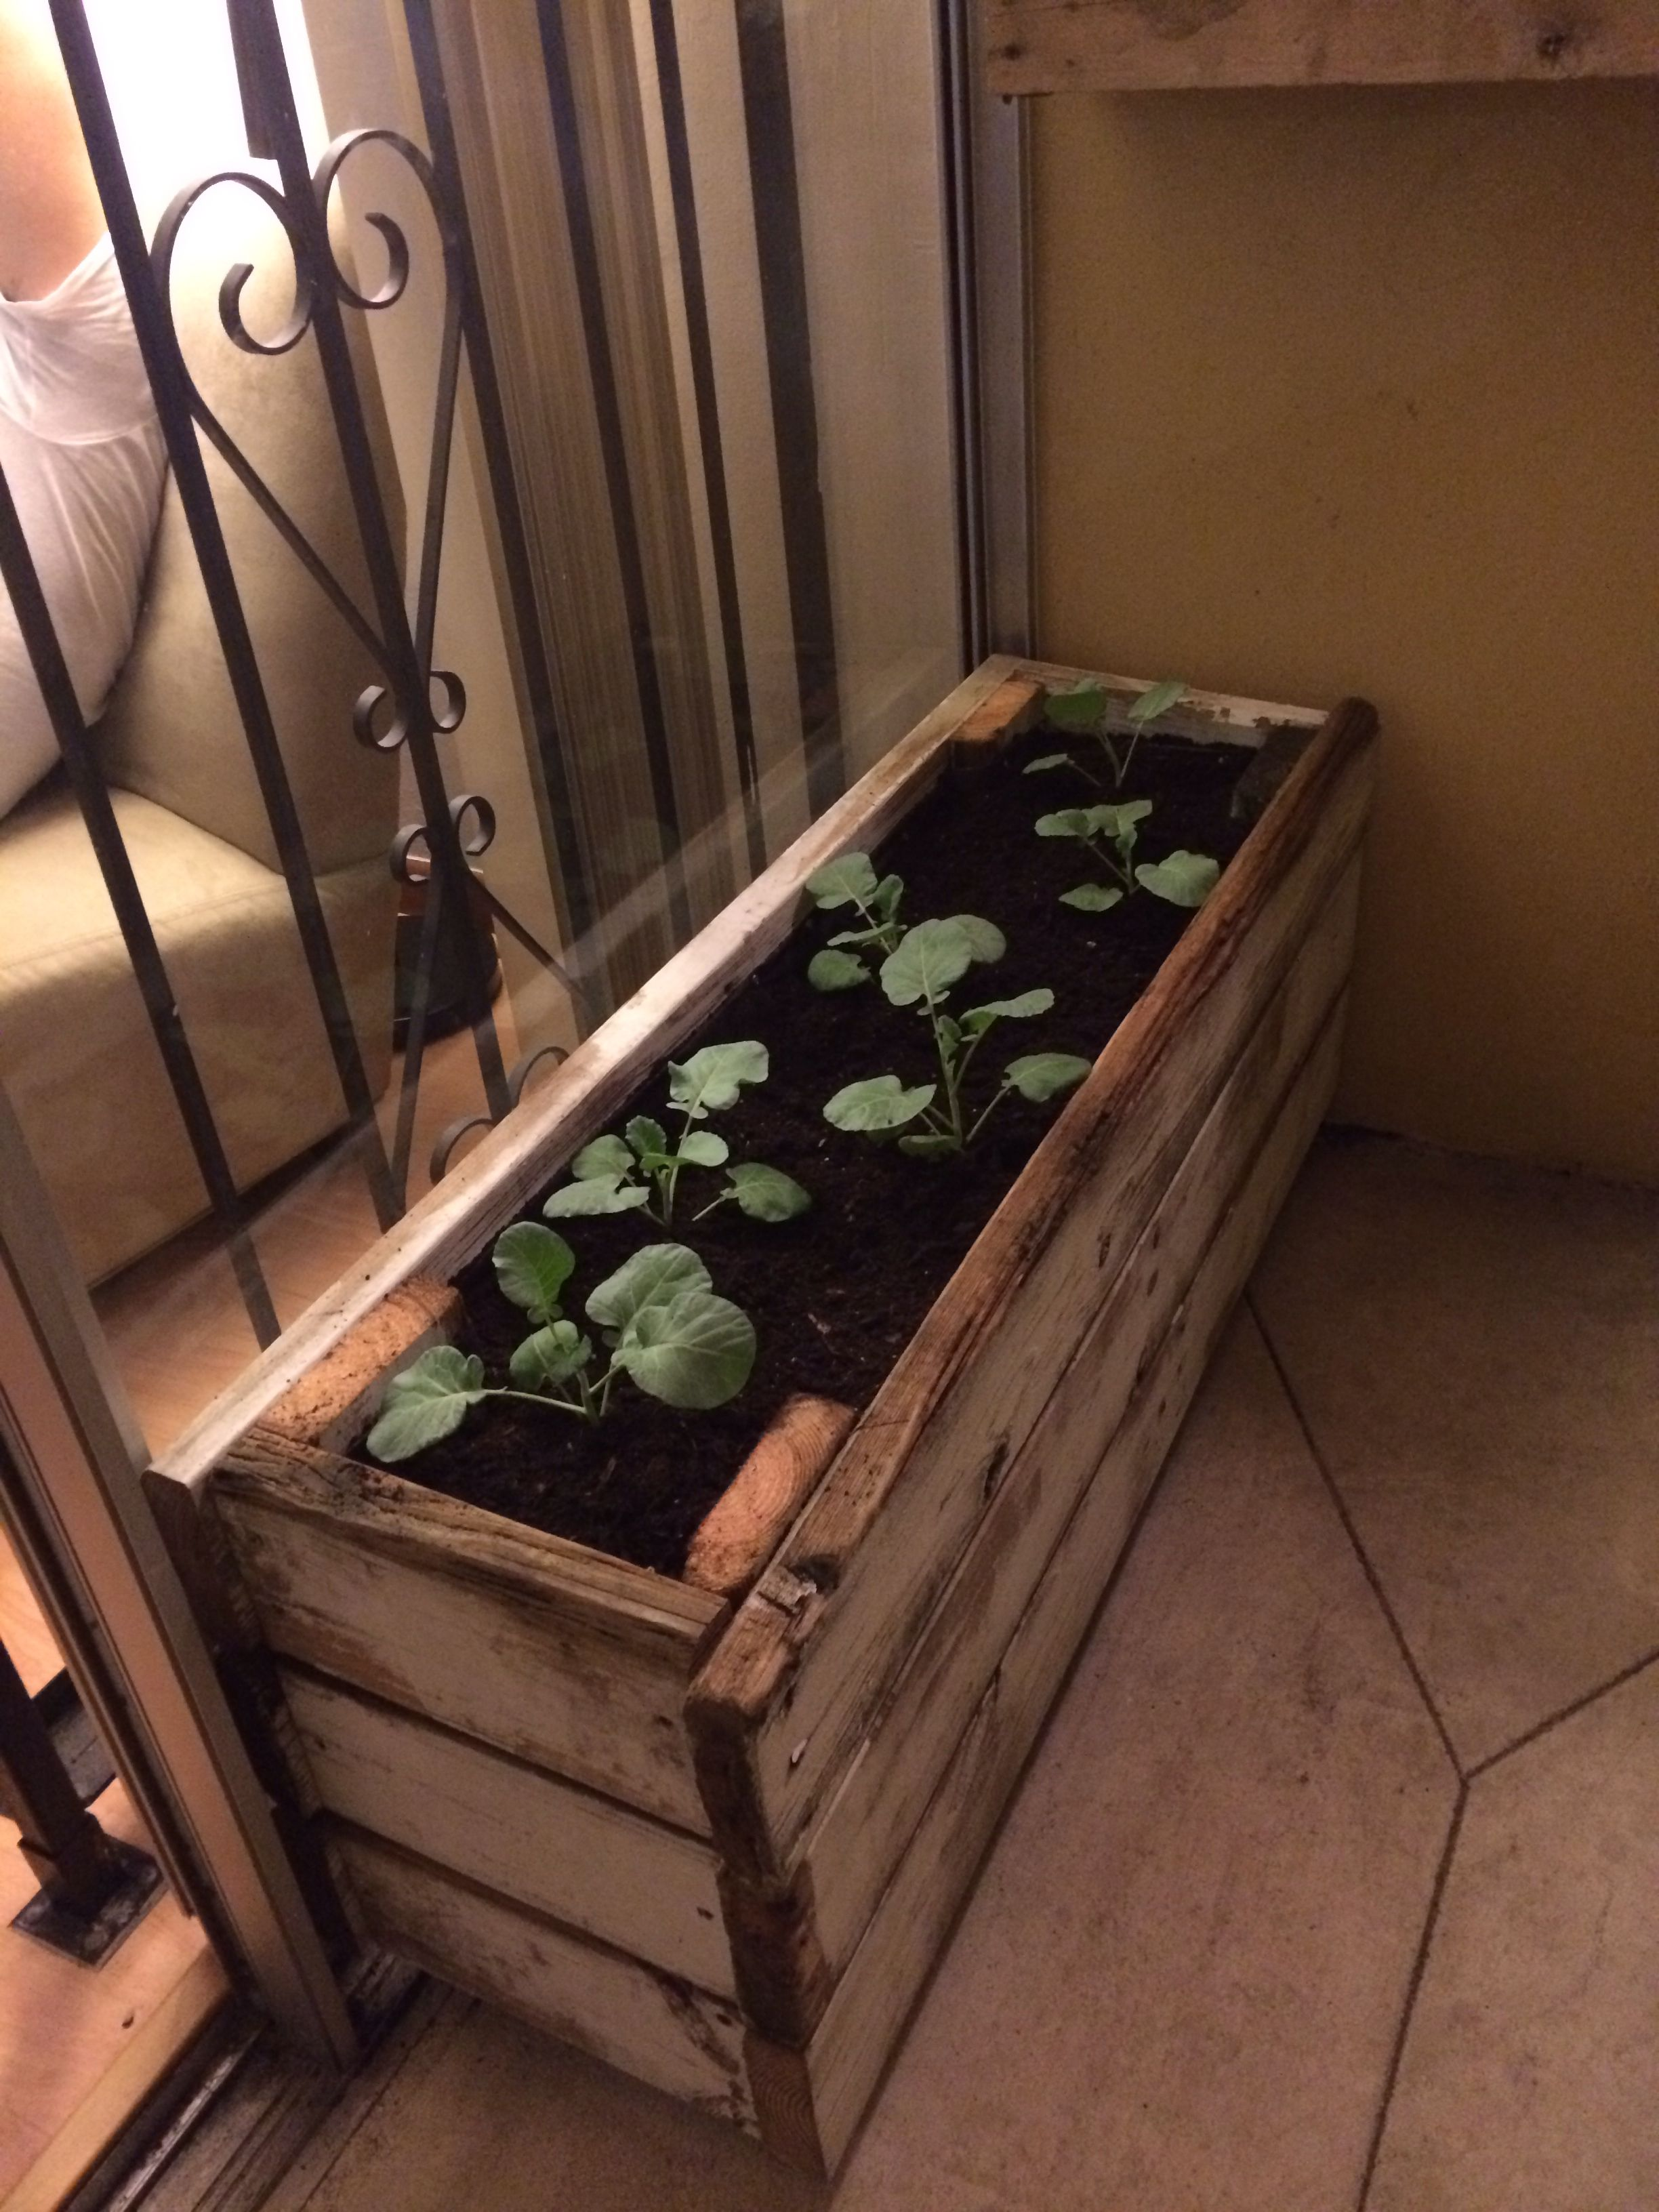 Be still like vegetables lay like broccoli storage